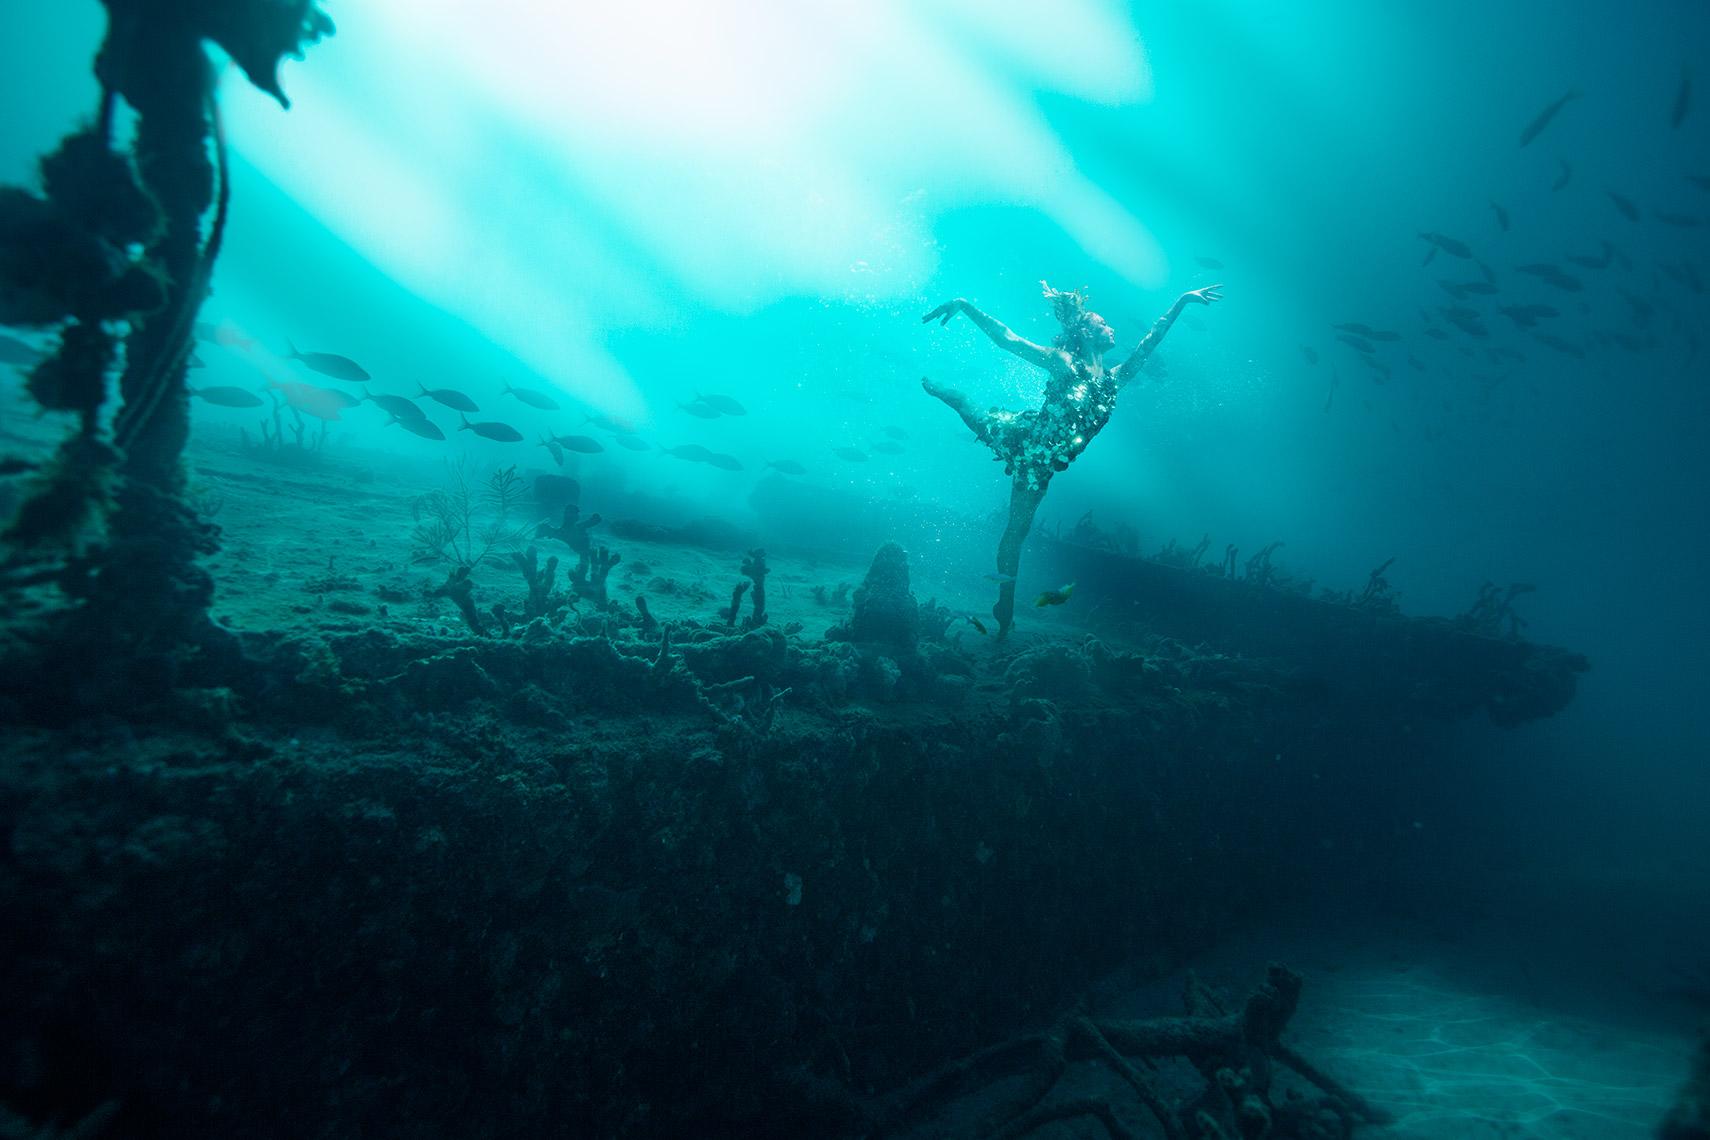 underwater.ballerina.jpg